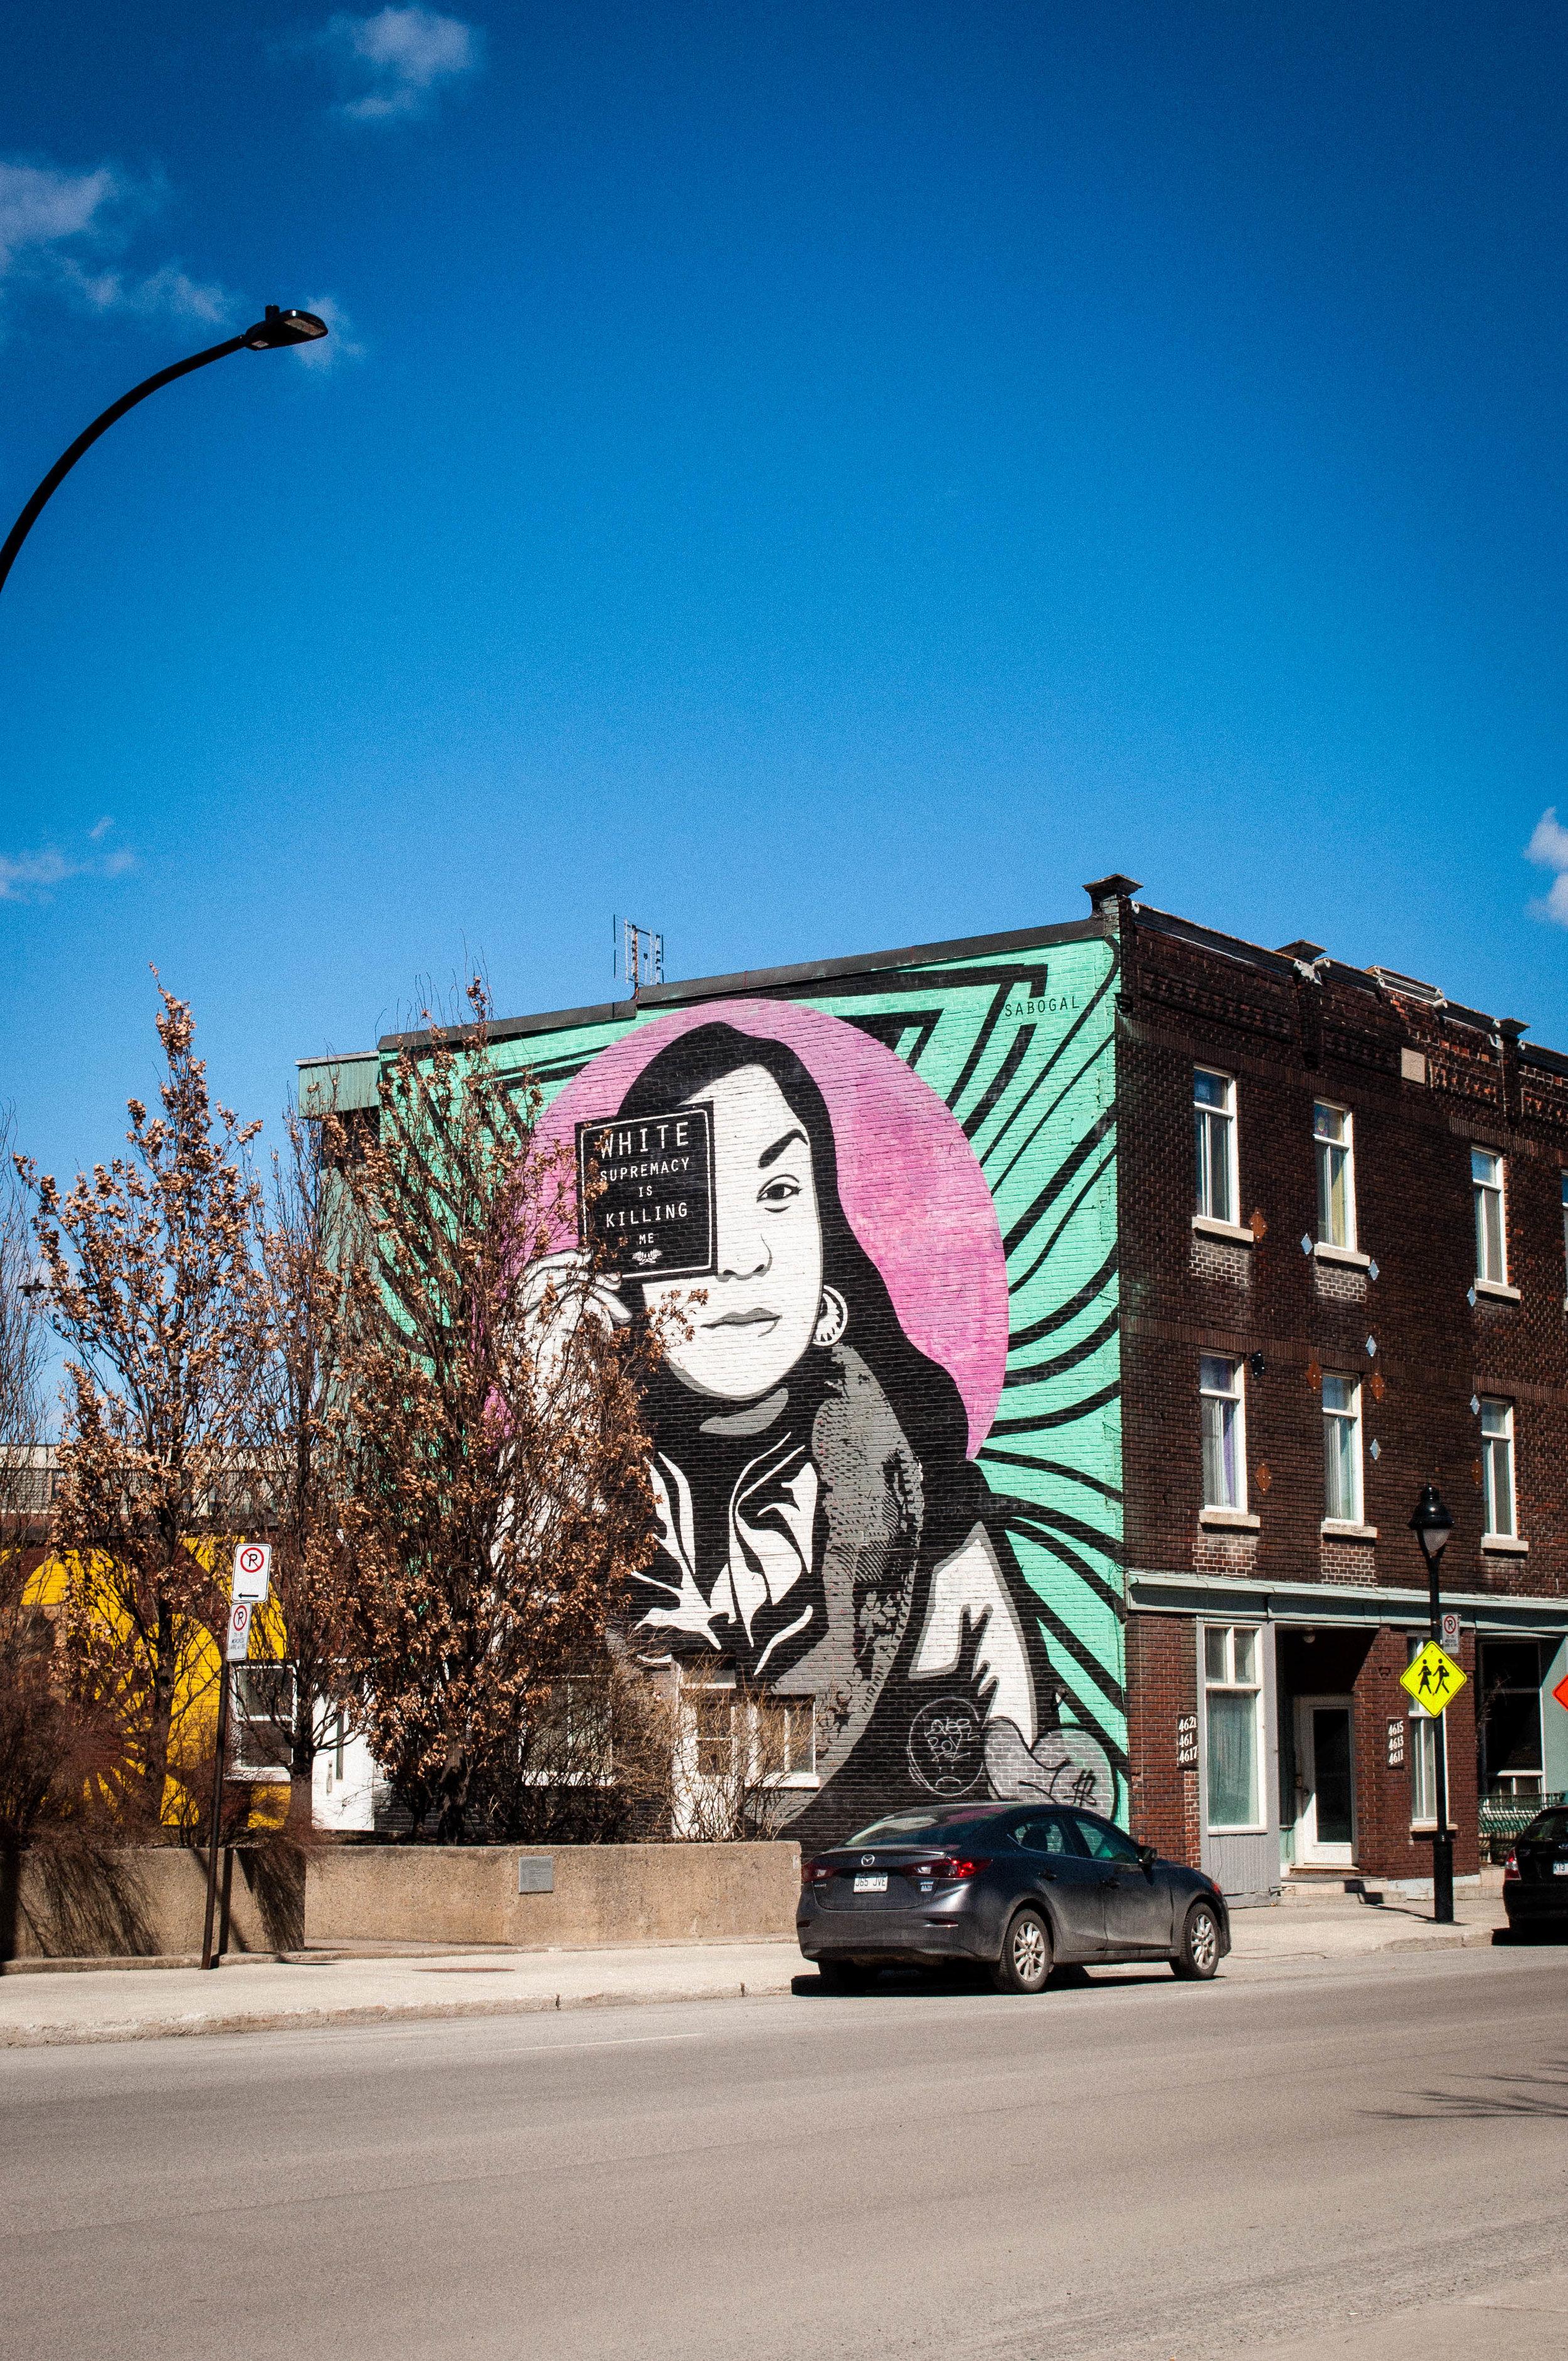 Graffiti in Saint-Henri by a Native American Artist. Graffiti proposed as the best street art in Montreal